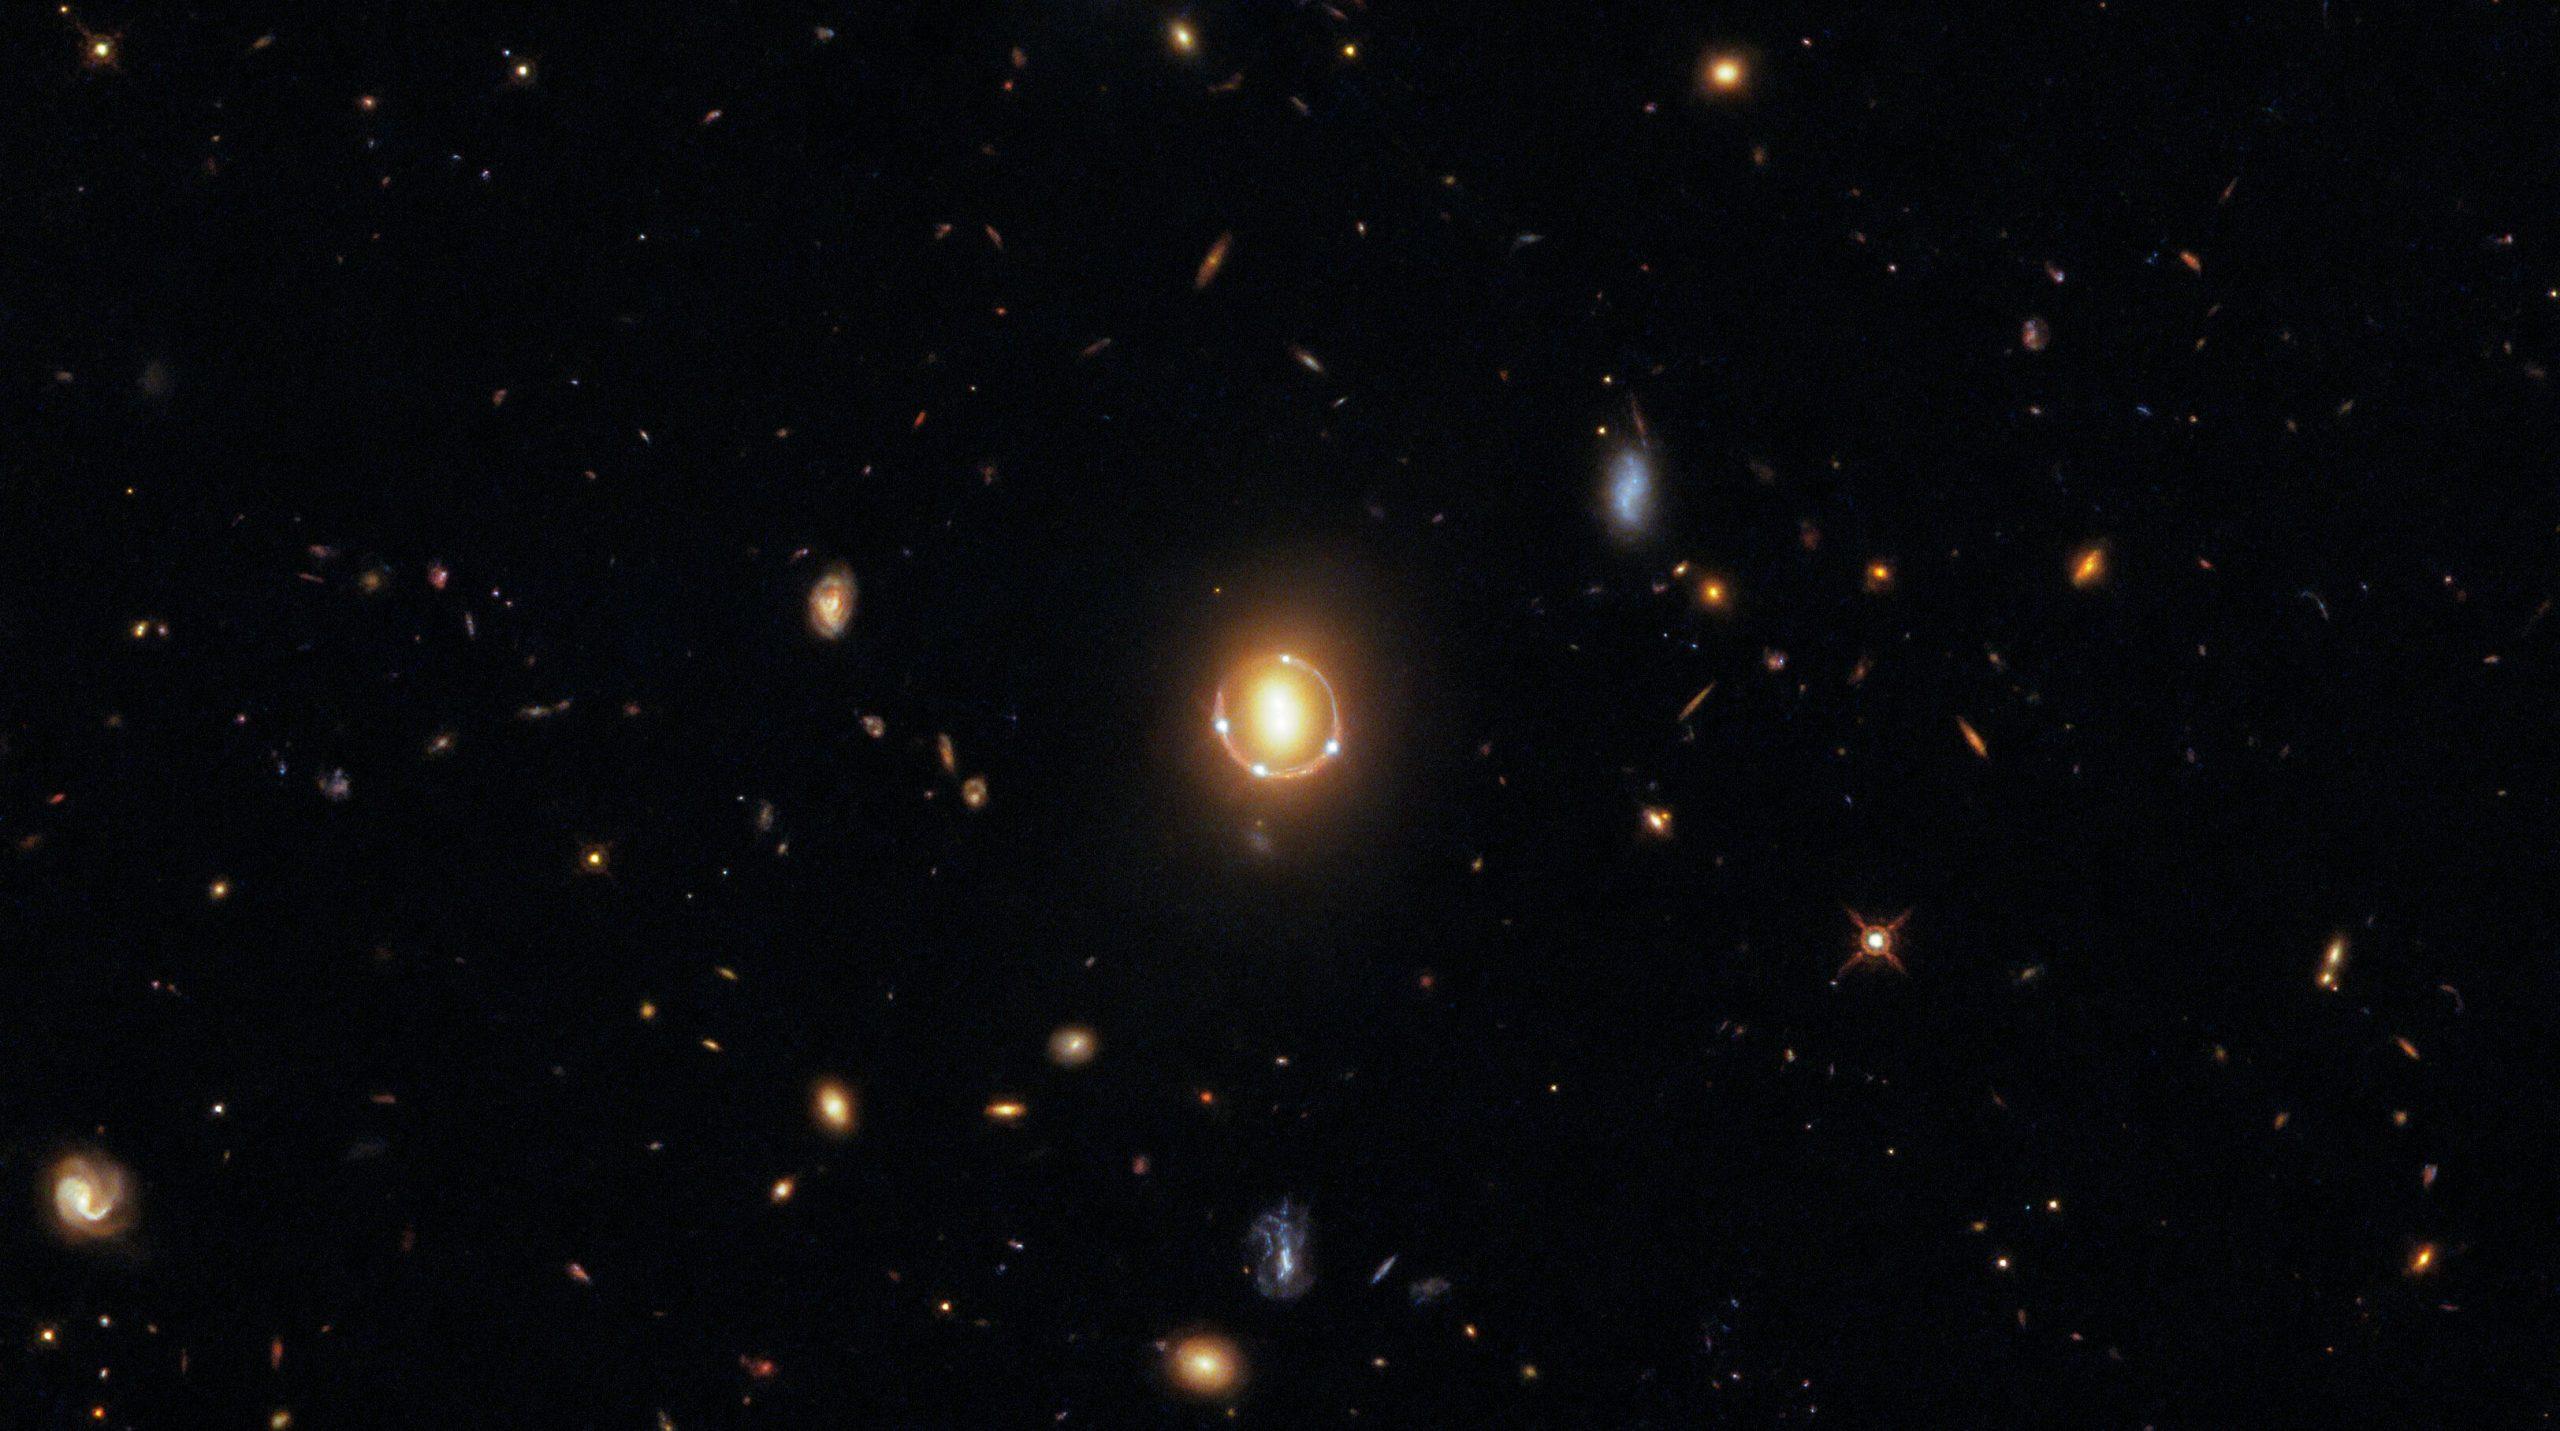 квазар и галактики